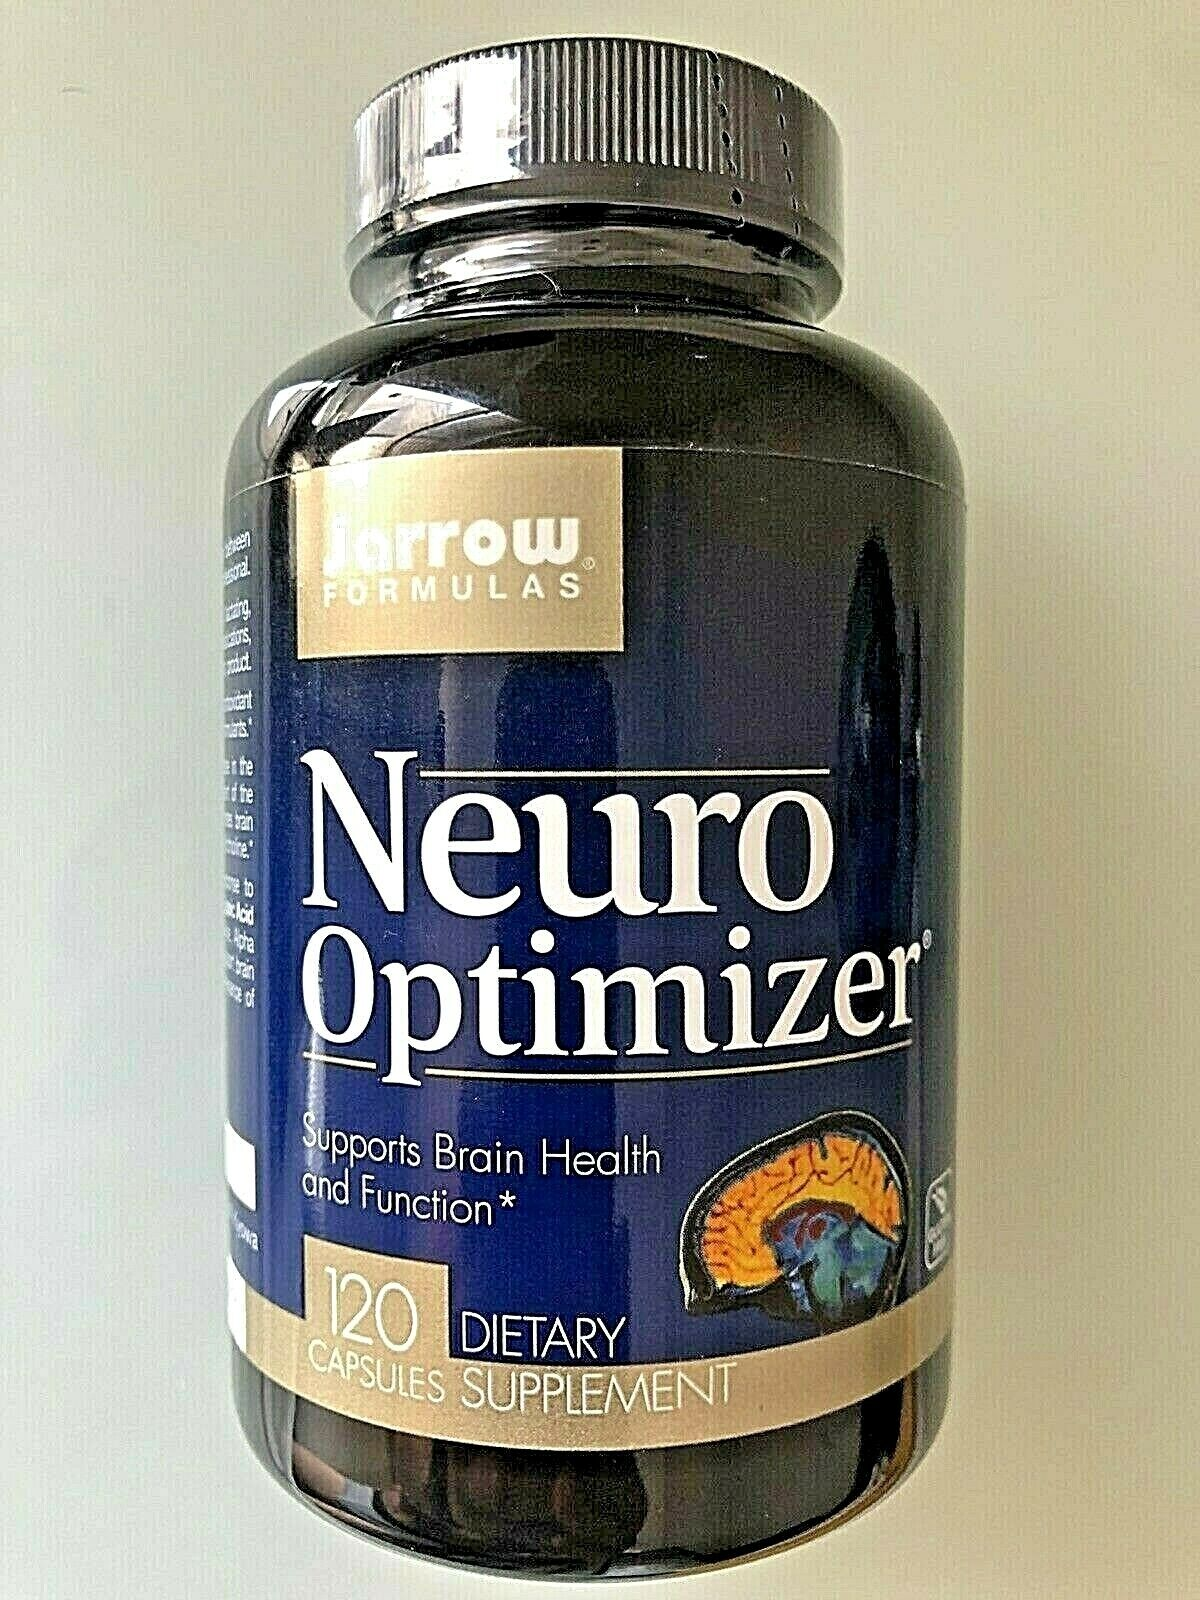 Jarrow Formulas: NEURO OPTIMIZER (120 Ct)   SUPPORTS: BRAIN HEALTH & FUNCTION